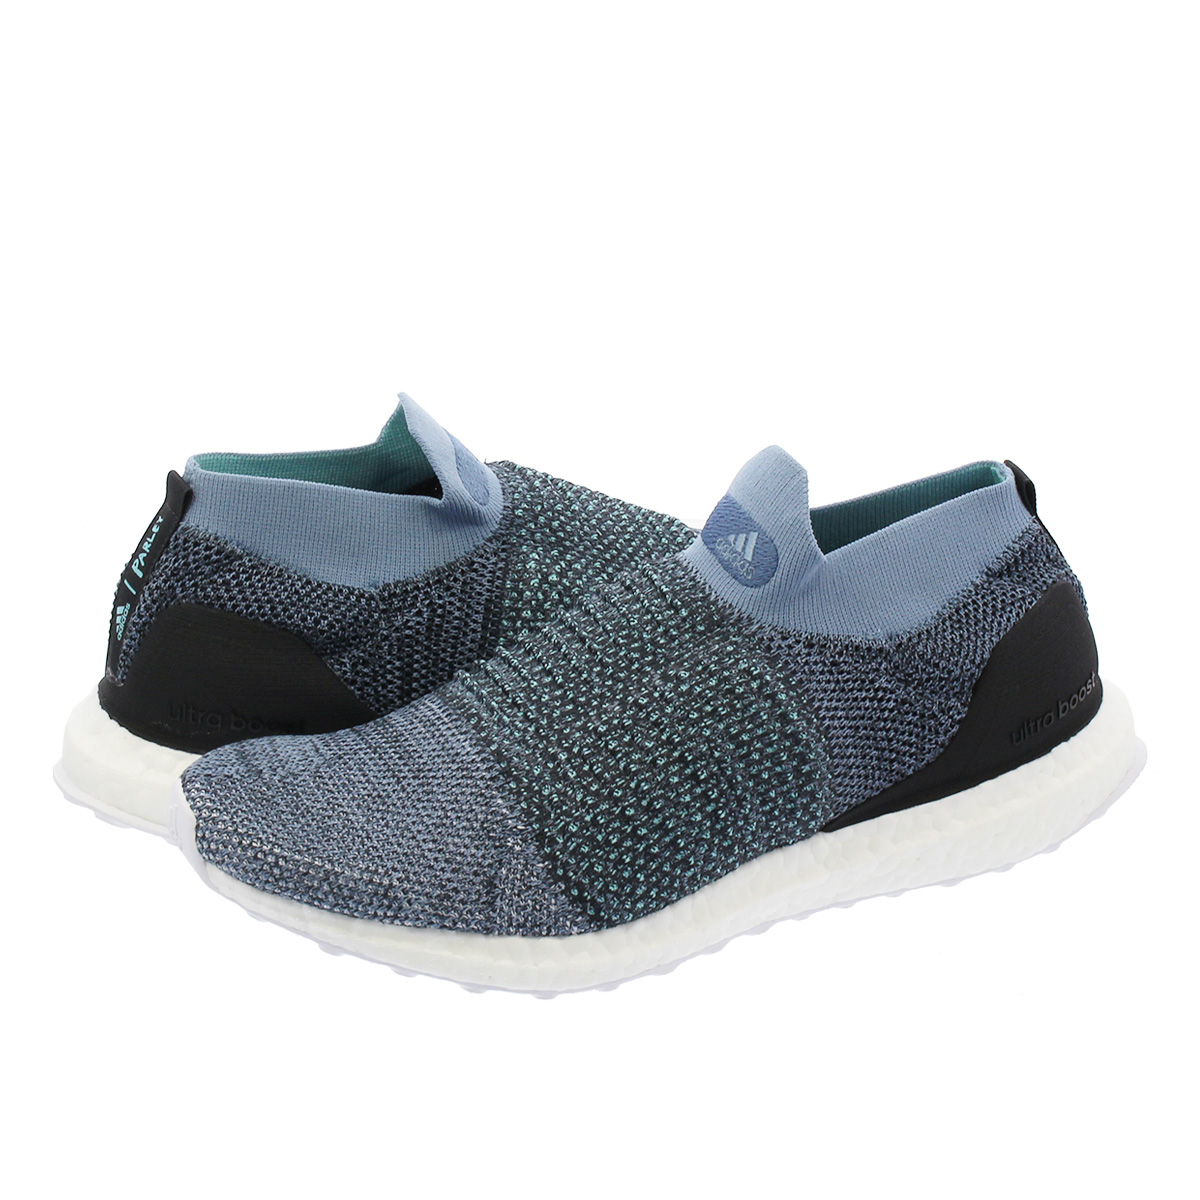 Select Shop Lowtex Adidas Ultraboost Laceless Parley Adidas Ultra